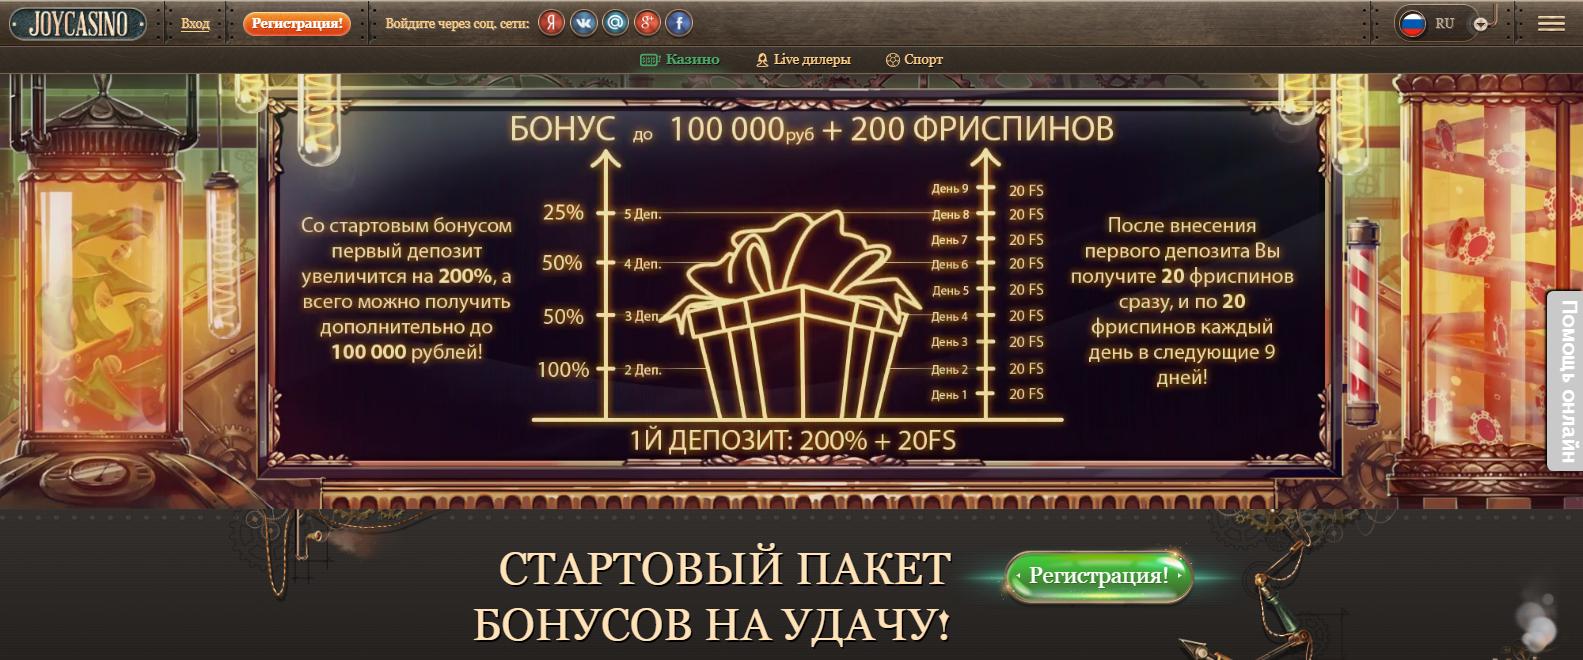 фото Промо код казино джой